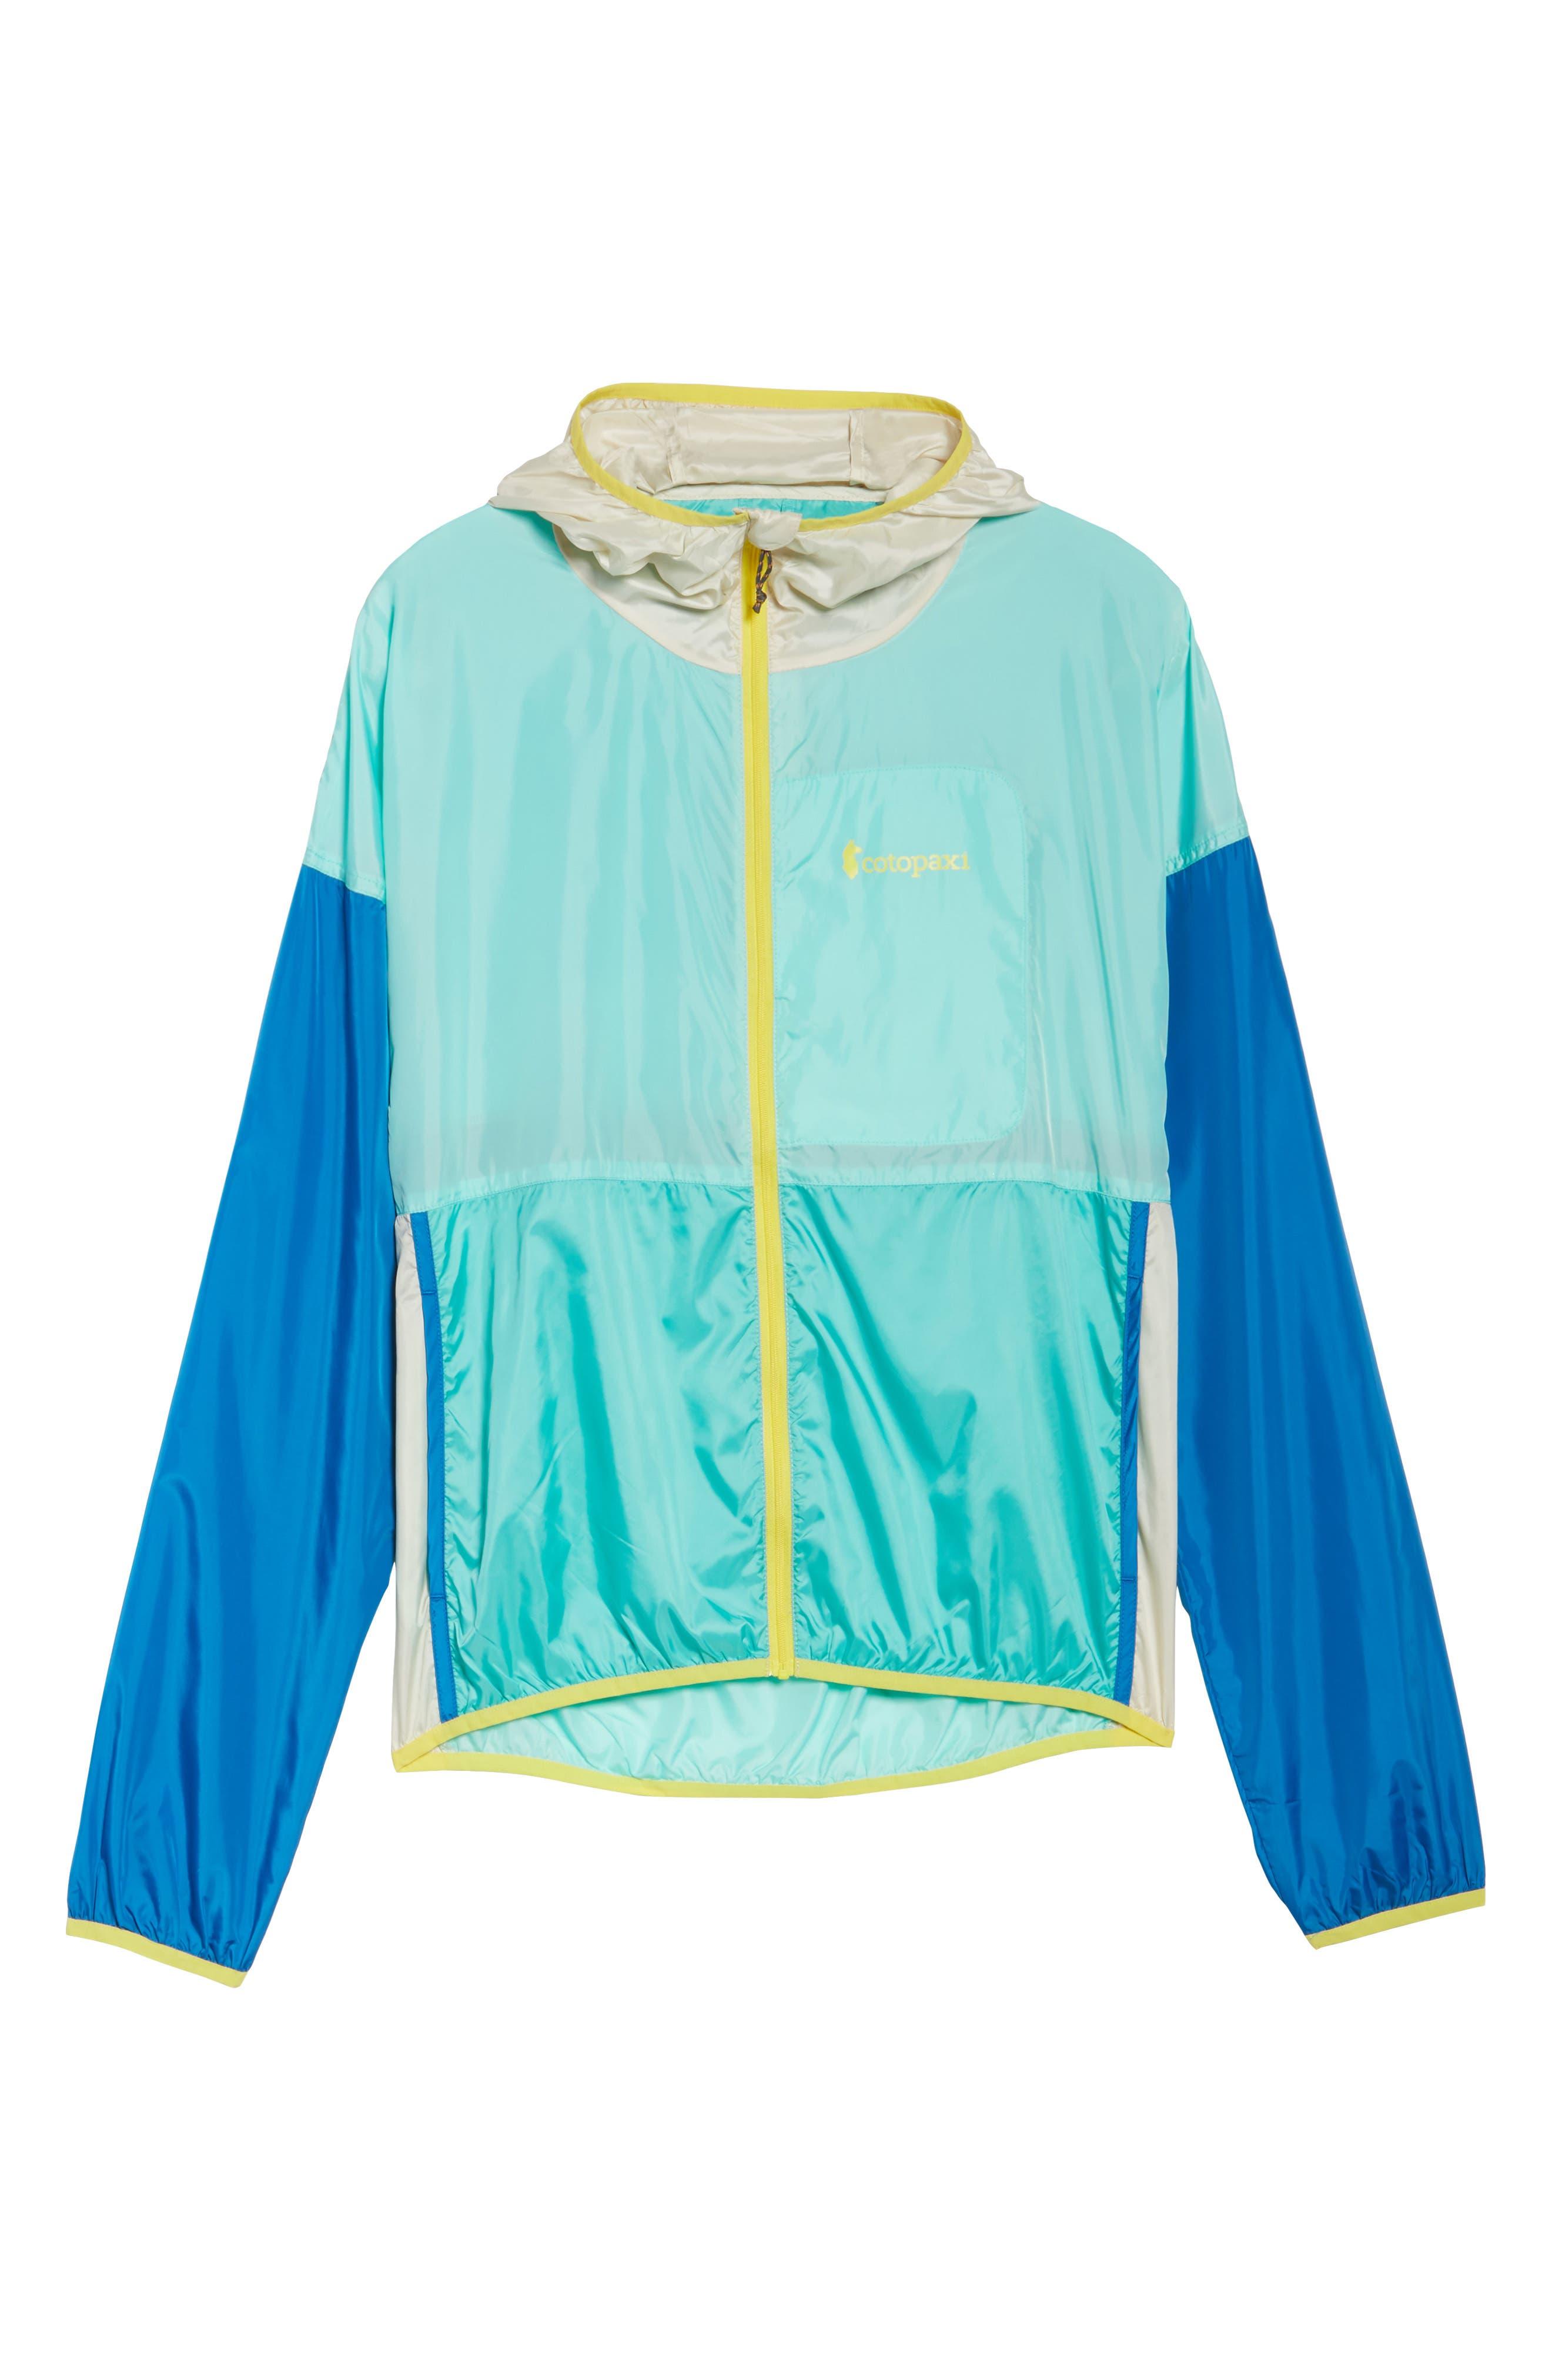 Teca Packable Water Resistant Windbreaker Jacket,                             Alternate thumbnail 7, color,                             Blue Crush